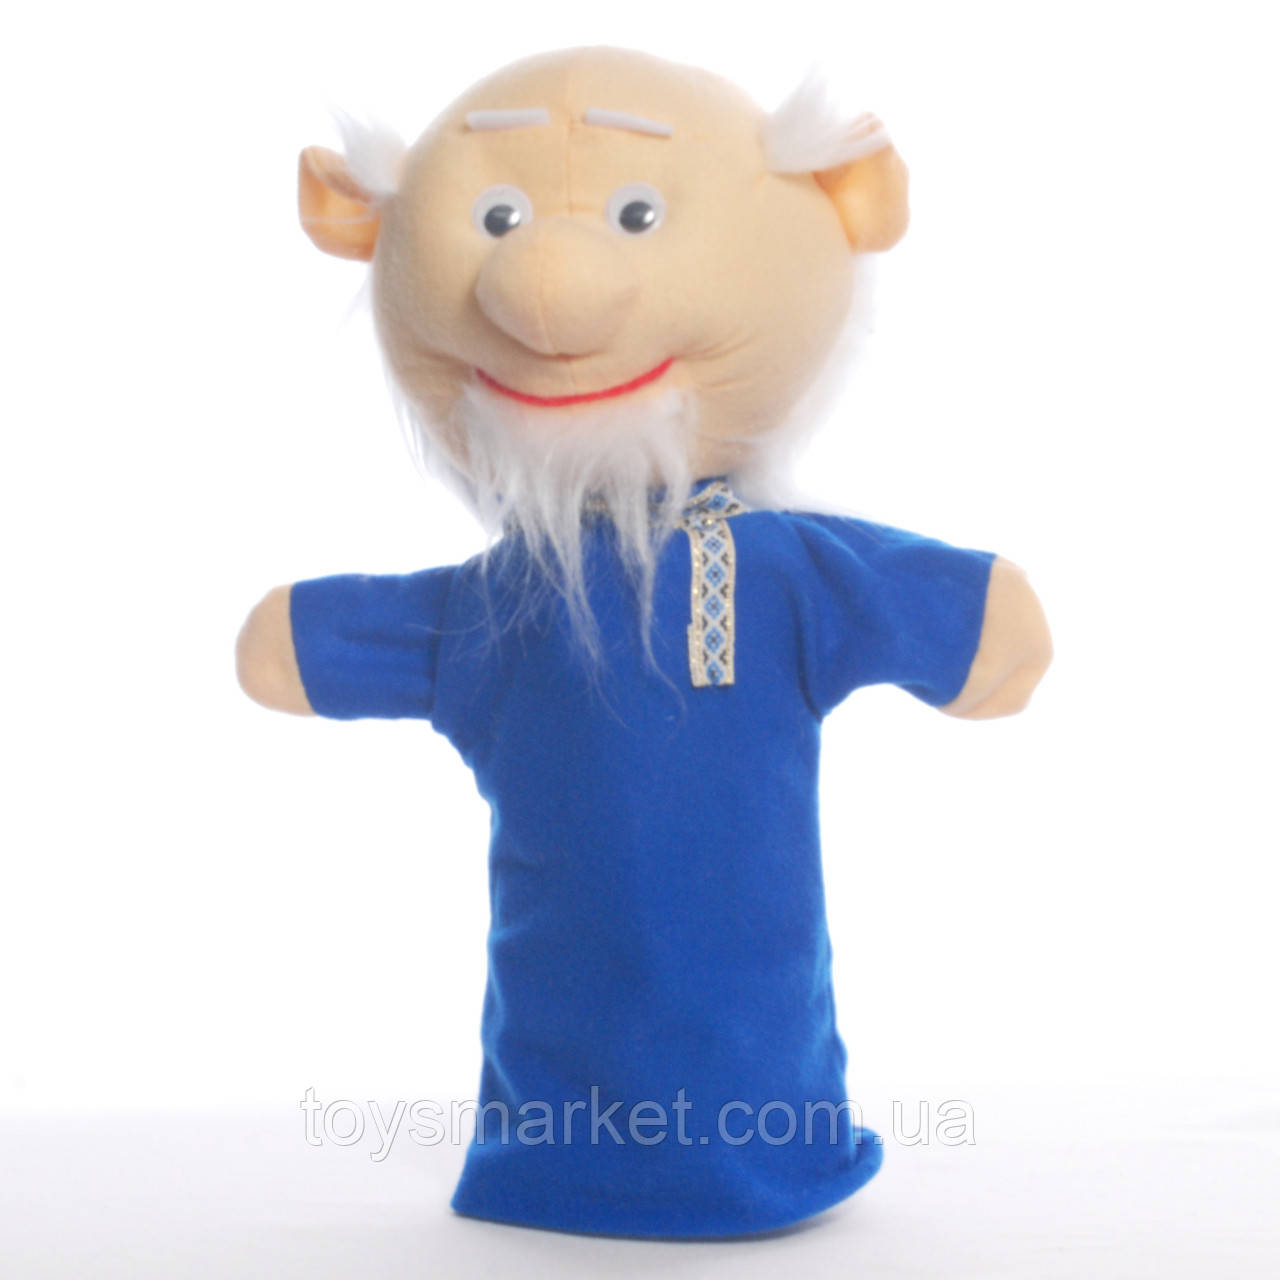 Игрушка рукавичка для кукольного театра Дед, кукла перчатка на руку